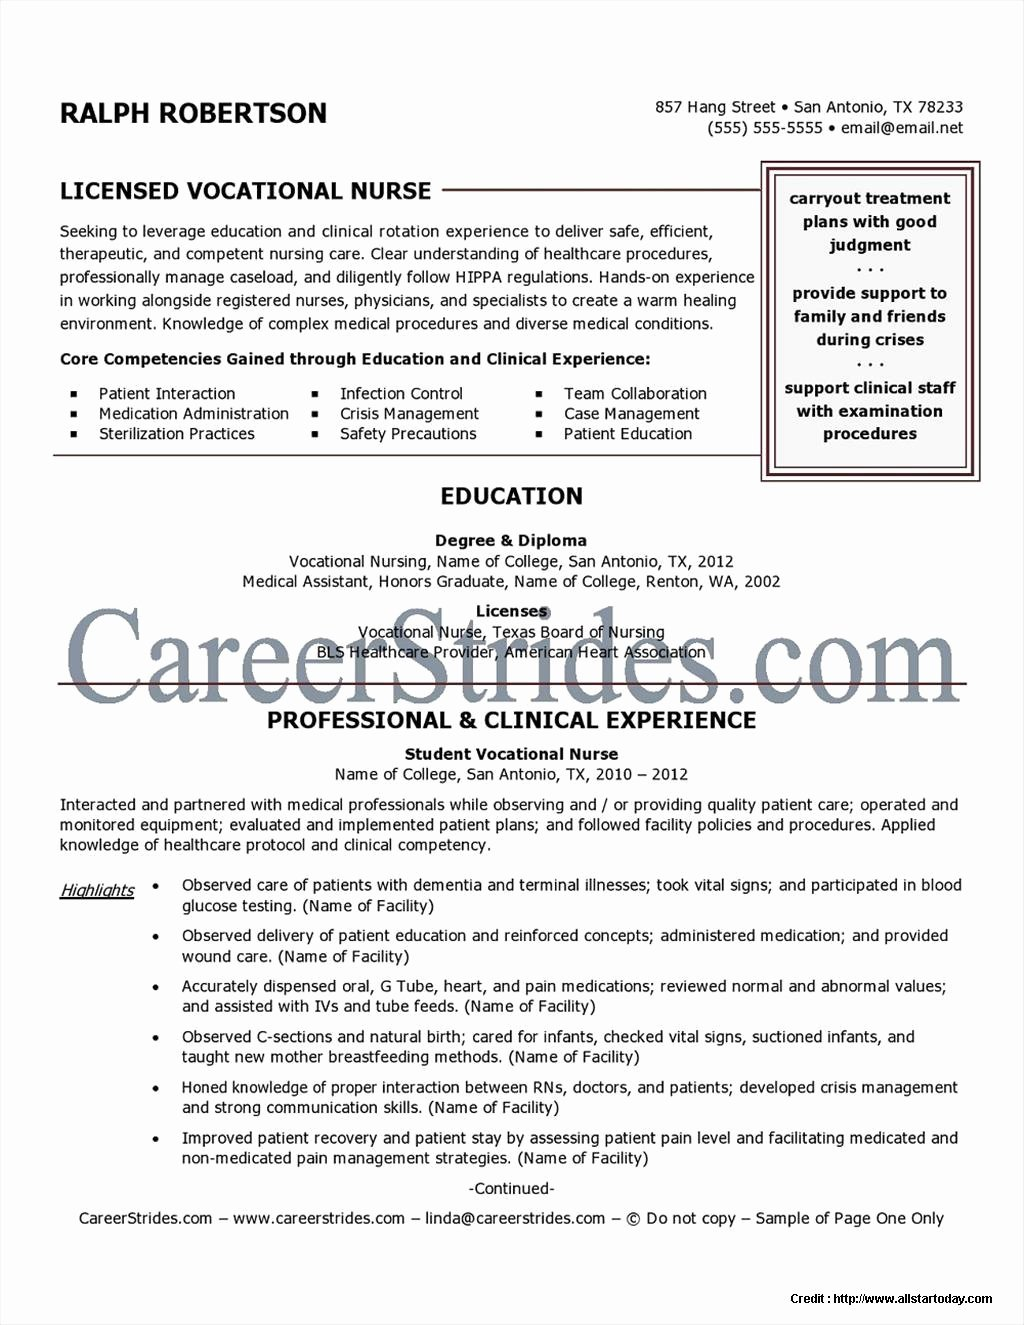 Sample Nurse Lvn Resume Resume Resume Examples Vdgojk7aze